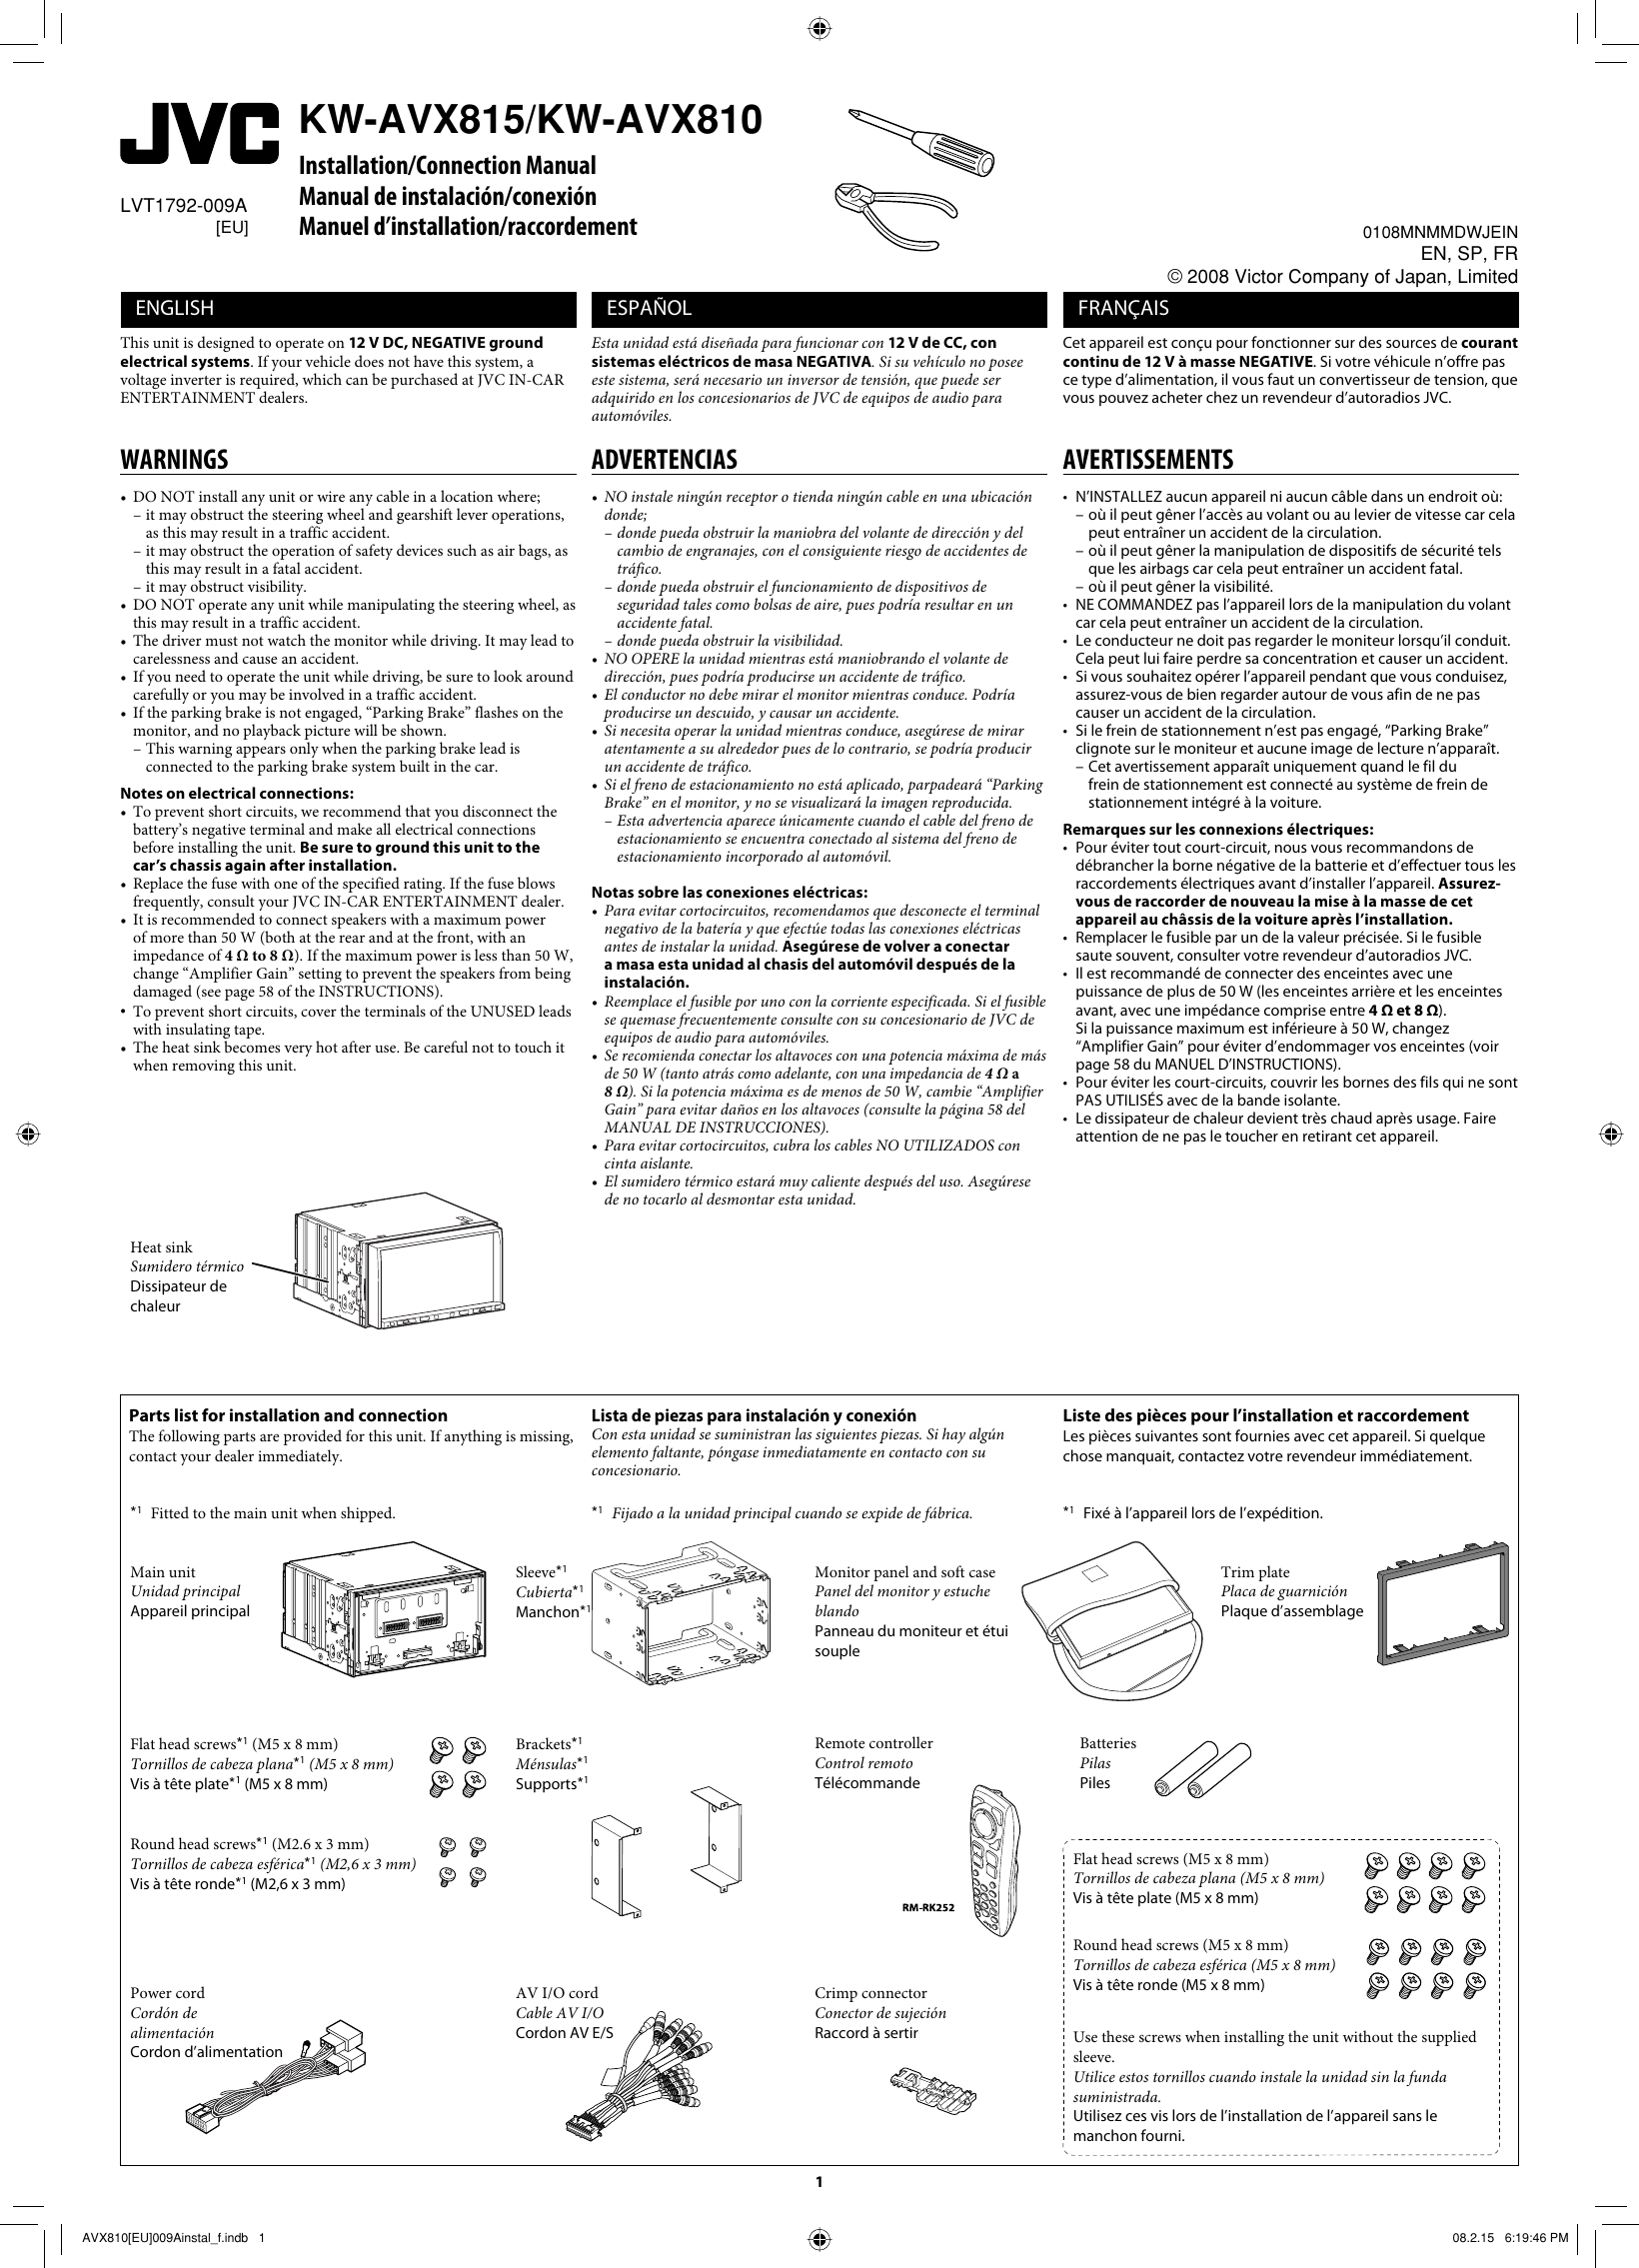 jvc kw avx810eu avx815 kw avx810 eu installation user manual rh usermanual wiki Online User Guide Quick Reference Guide